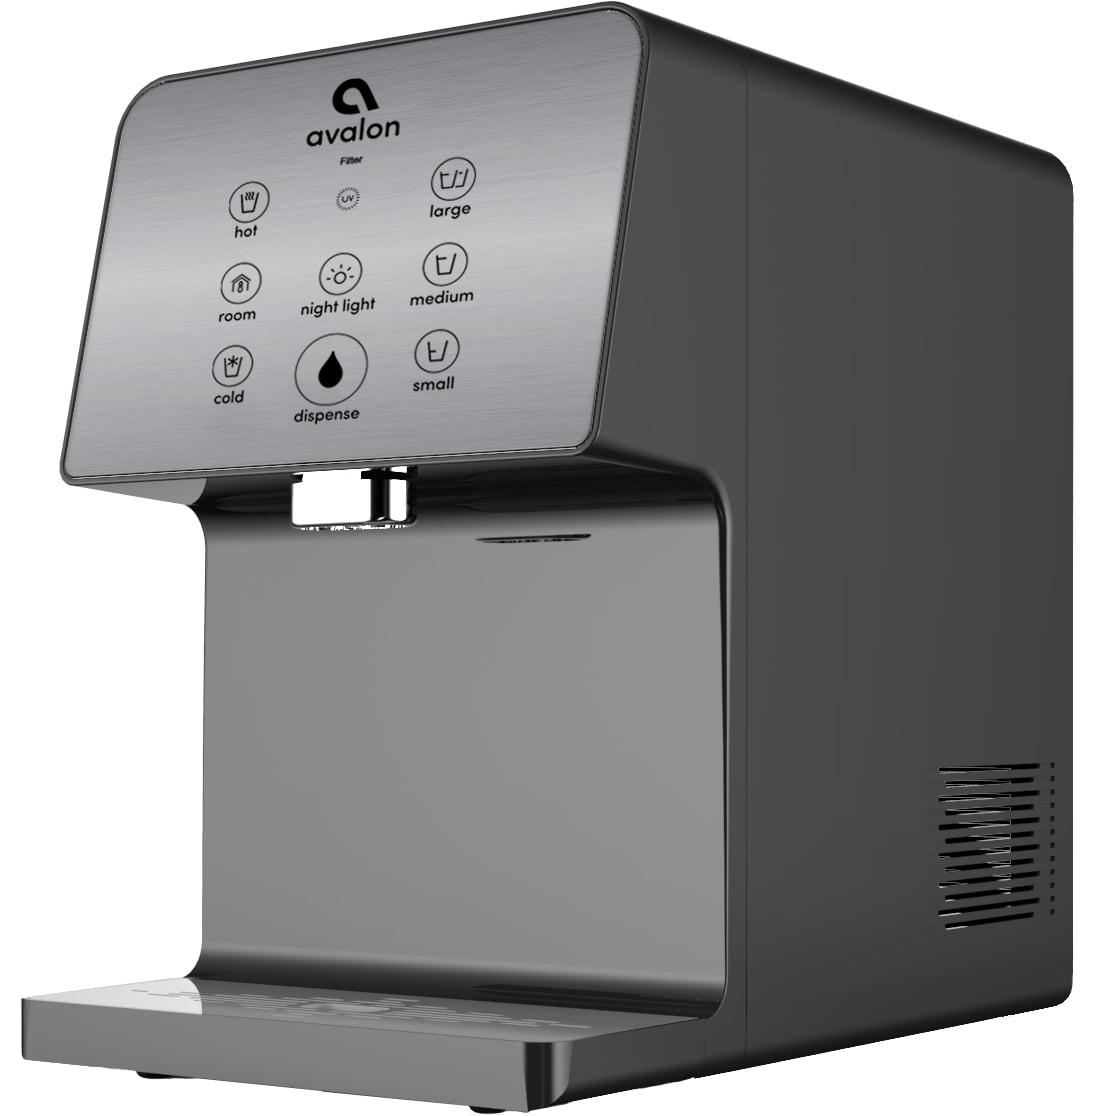 Avalon Electric Countertop Bottleless Water Cooler Water Dispenser, 3 Temperatures, UV Cleaning, 3 Dispensing Volumes- Grey